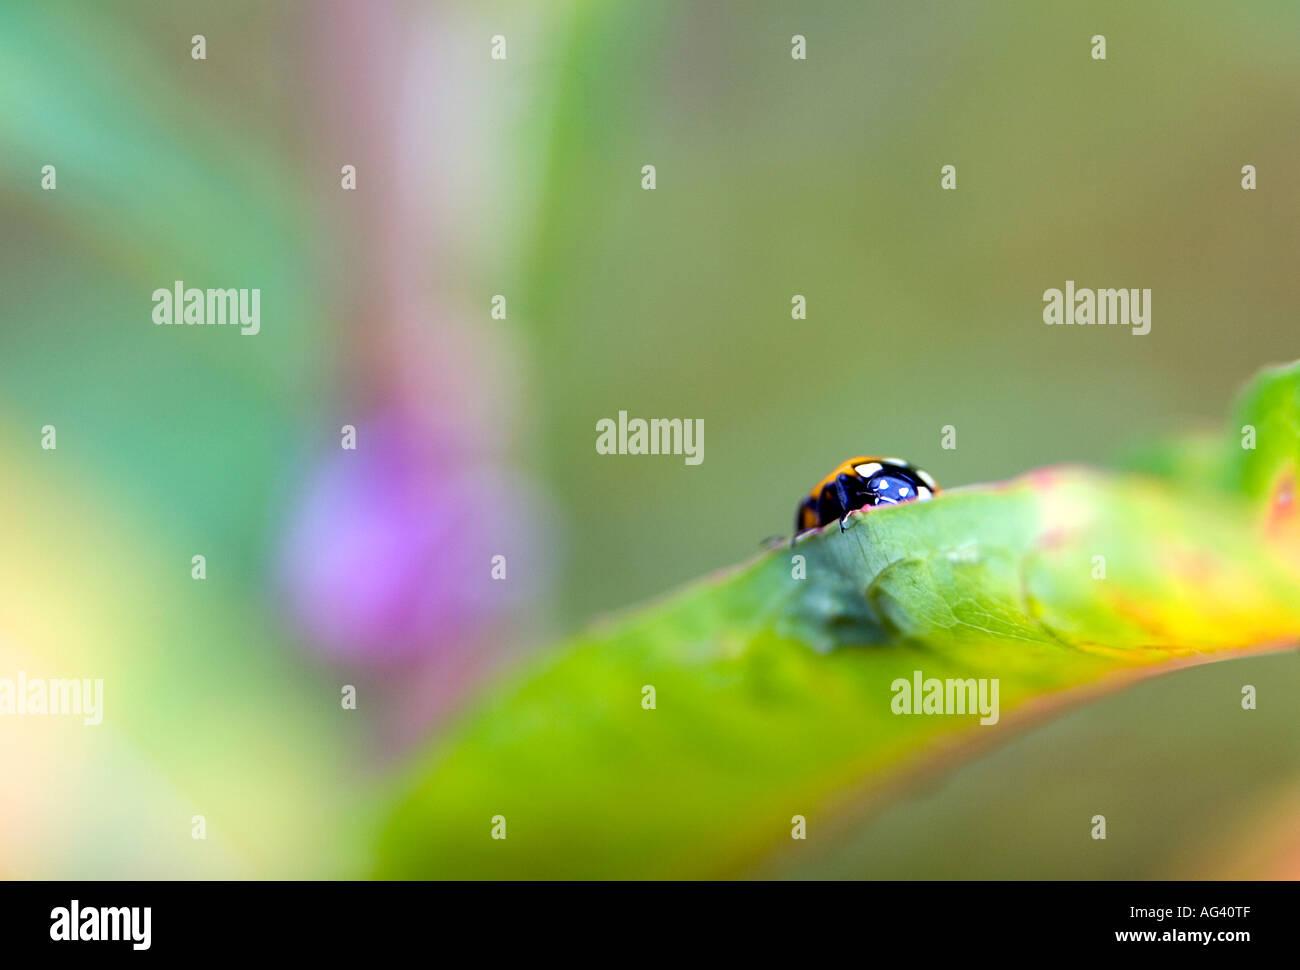 Coccinella magnifica. Ladybird on leaf. Selective focus - Stock Image